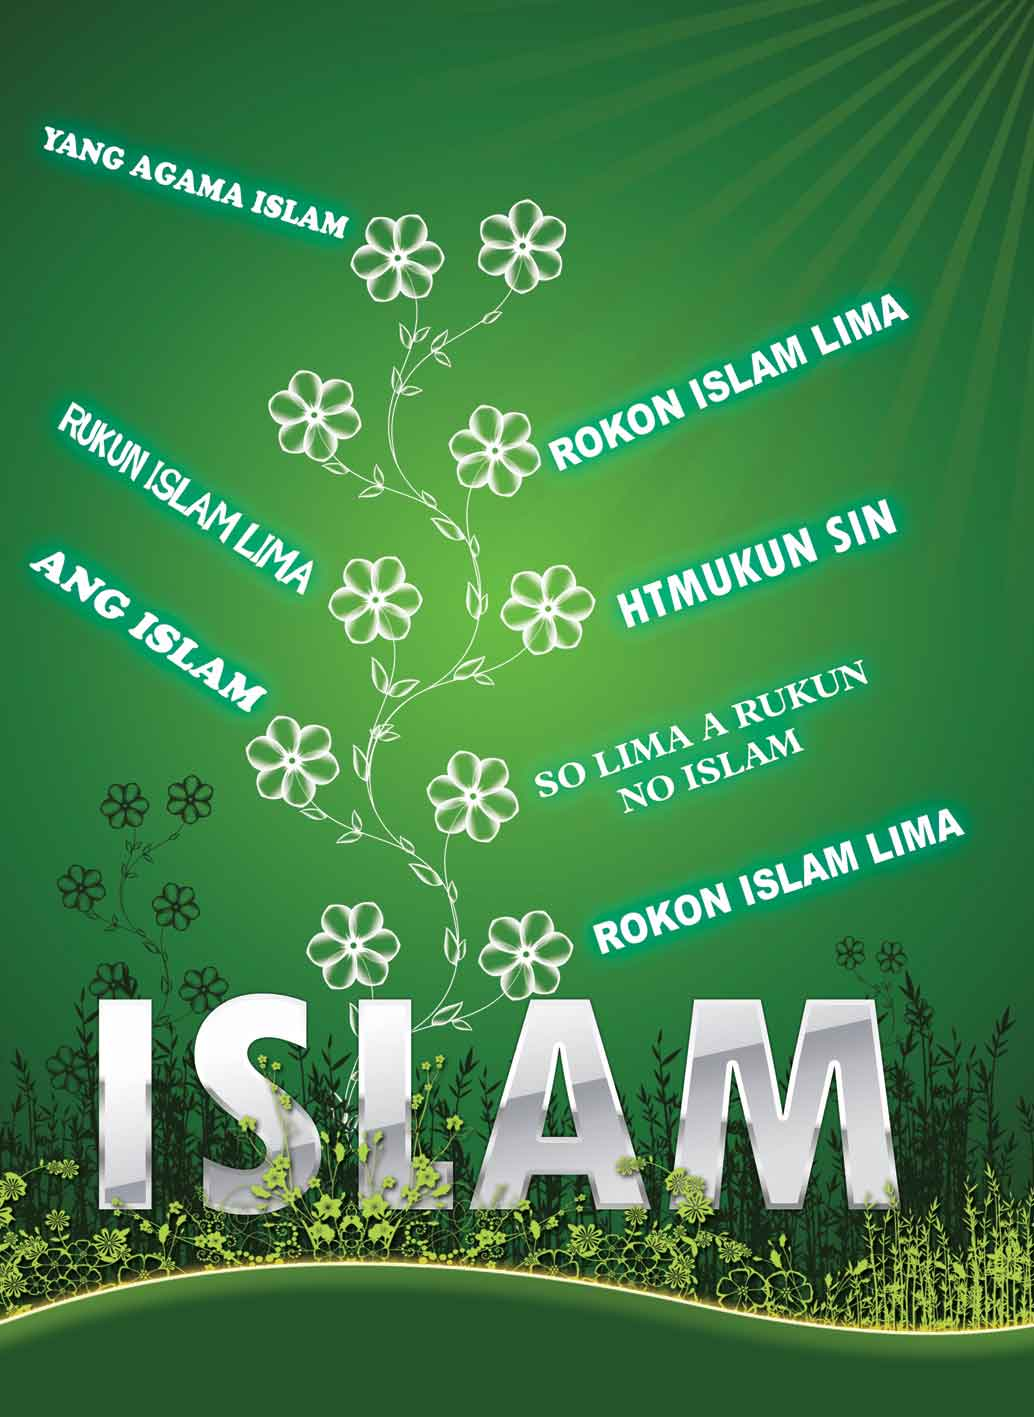 ROKON ISLAM LIMA